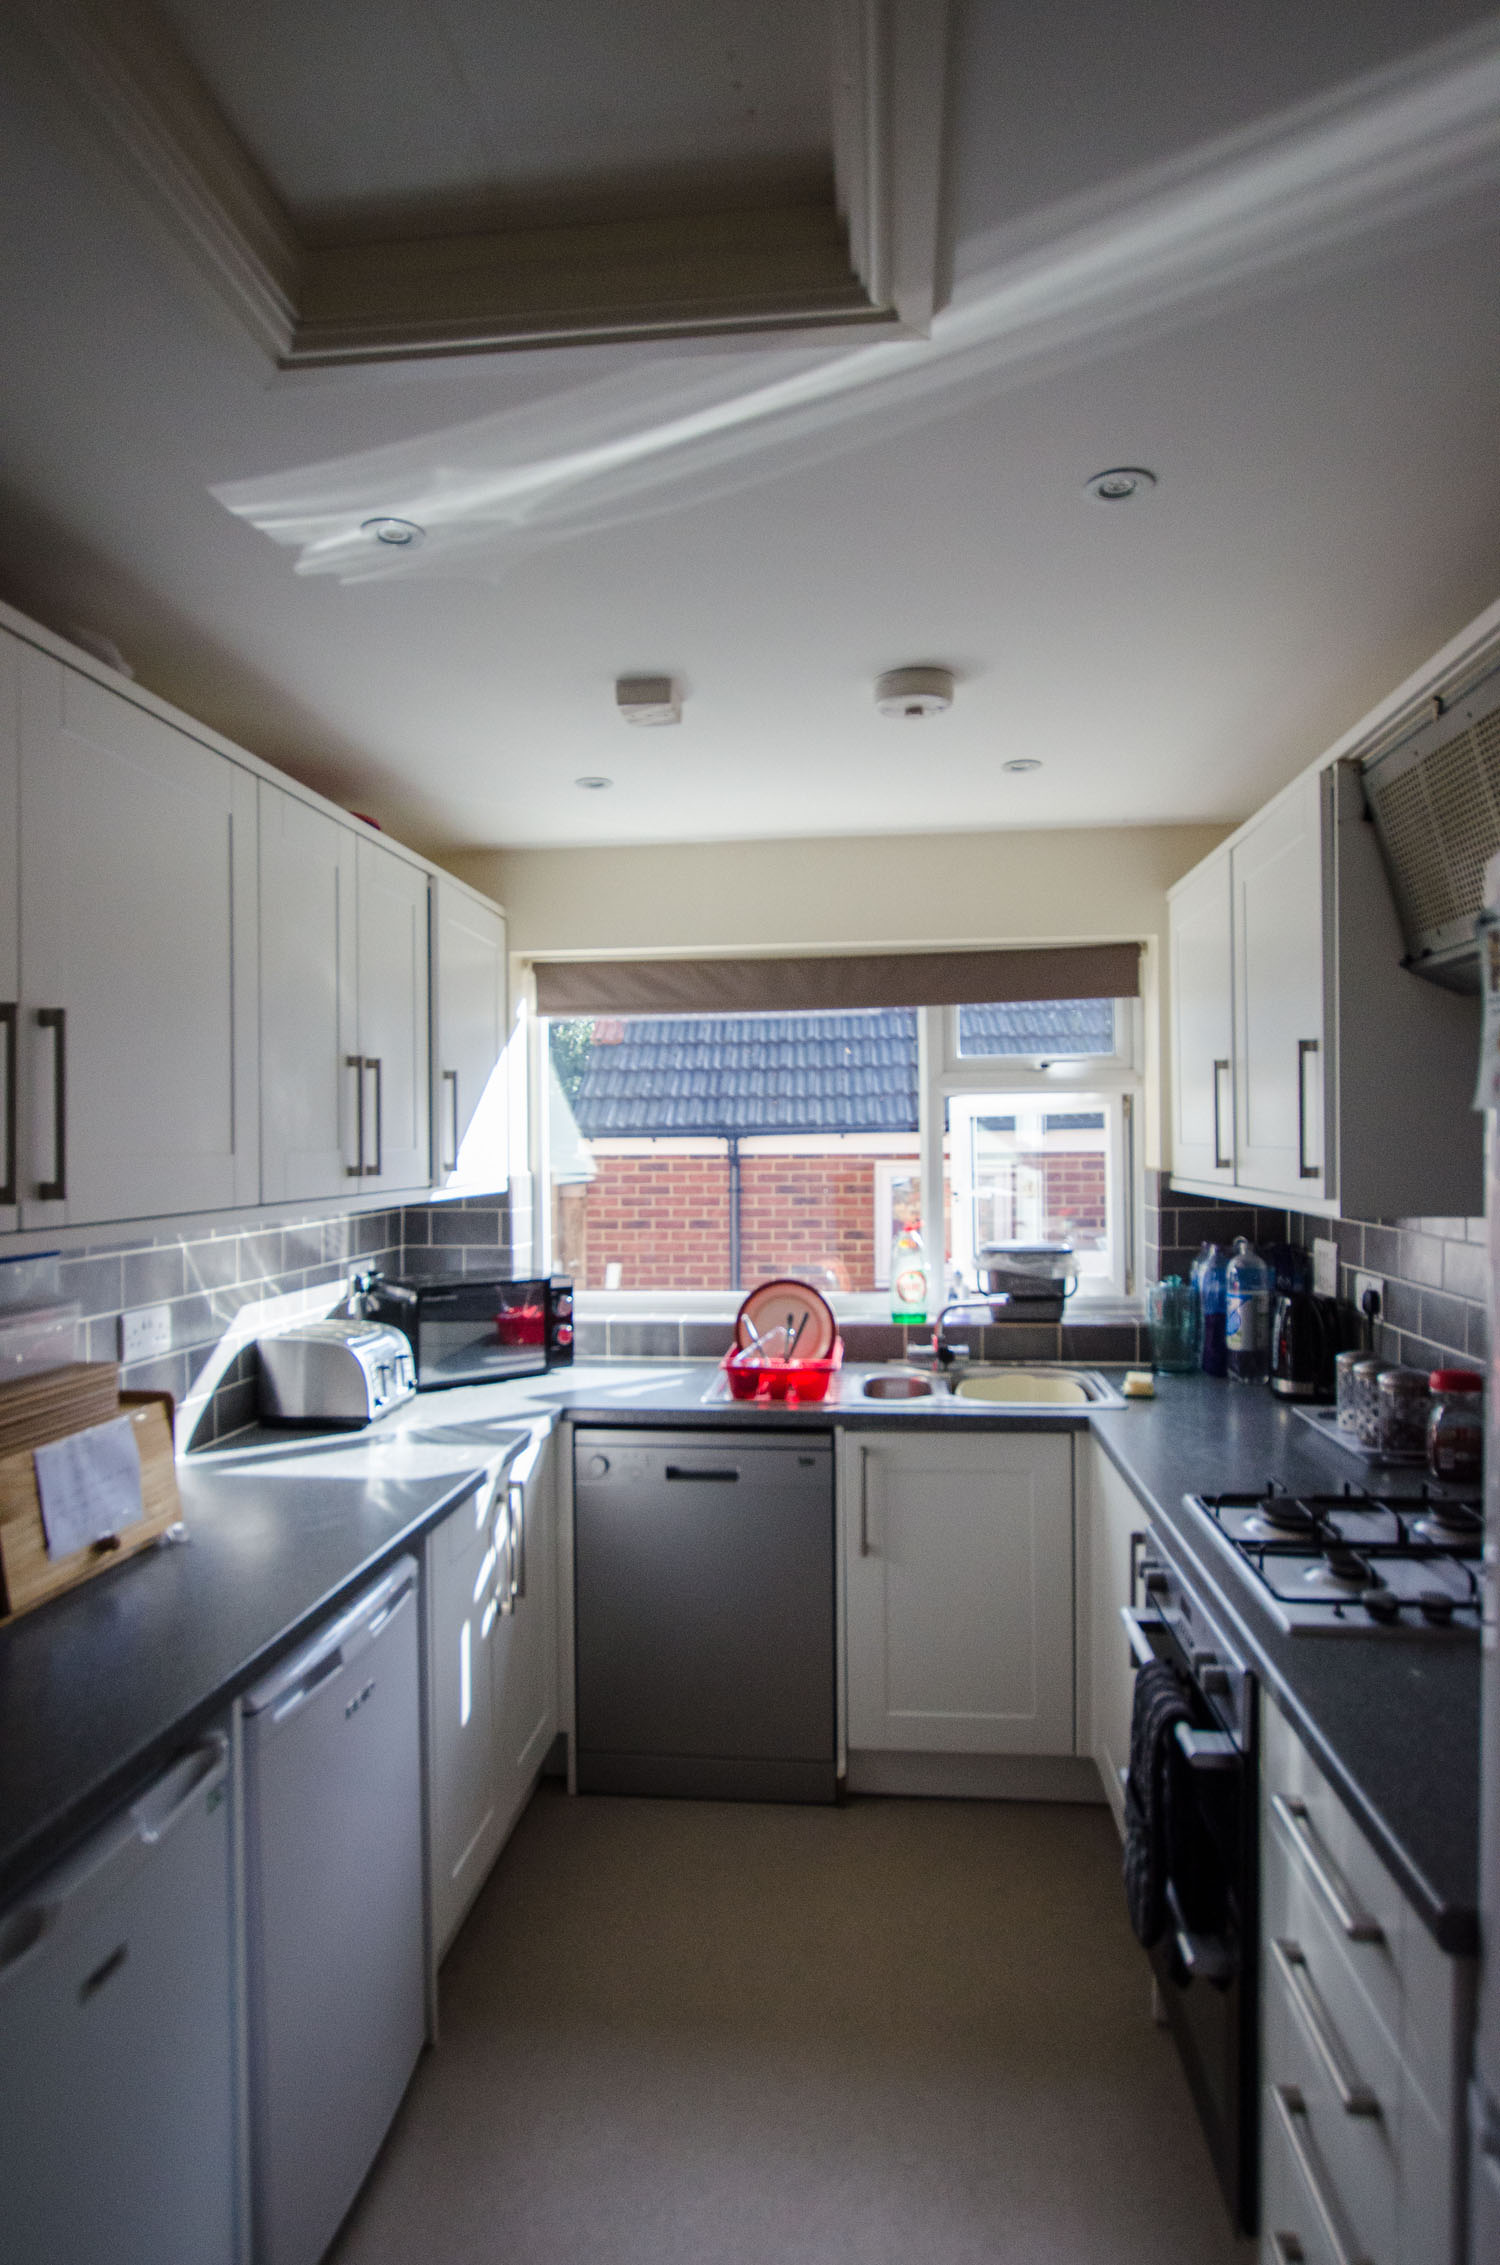 Abbey kitchen